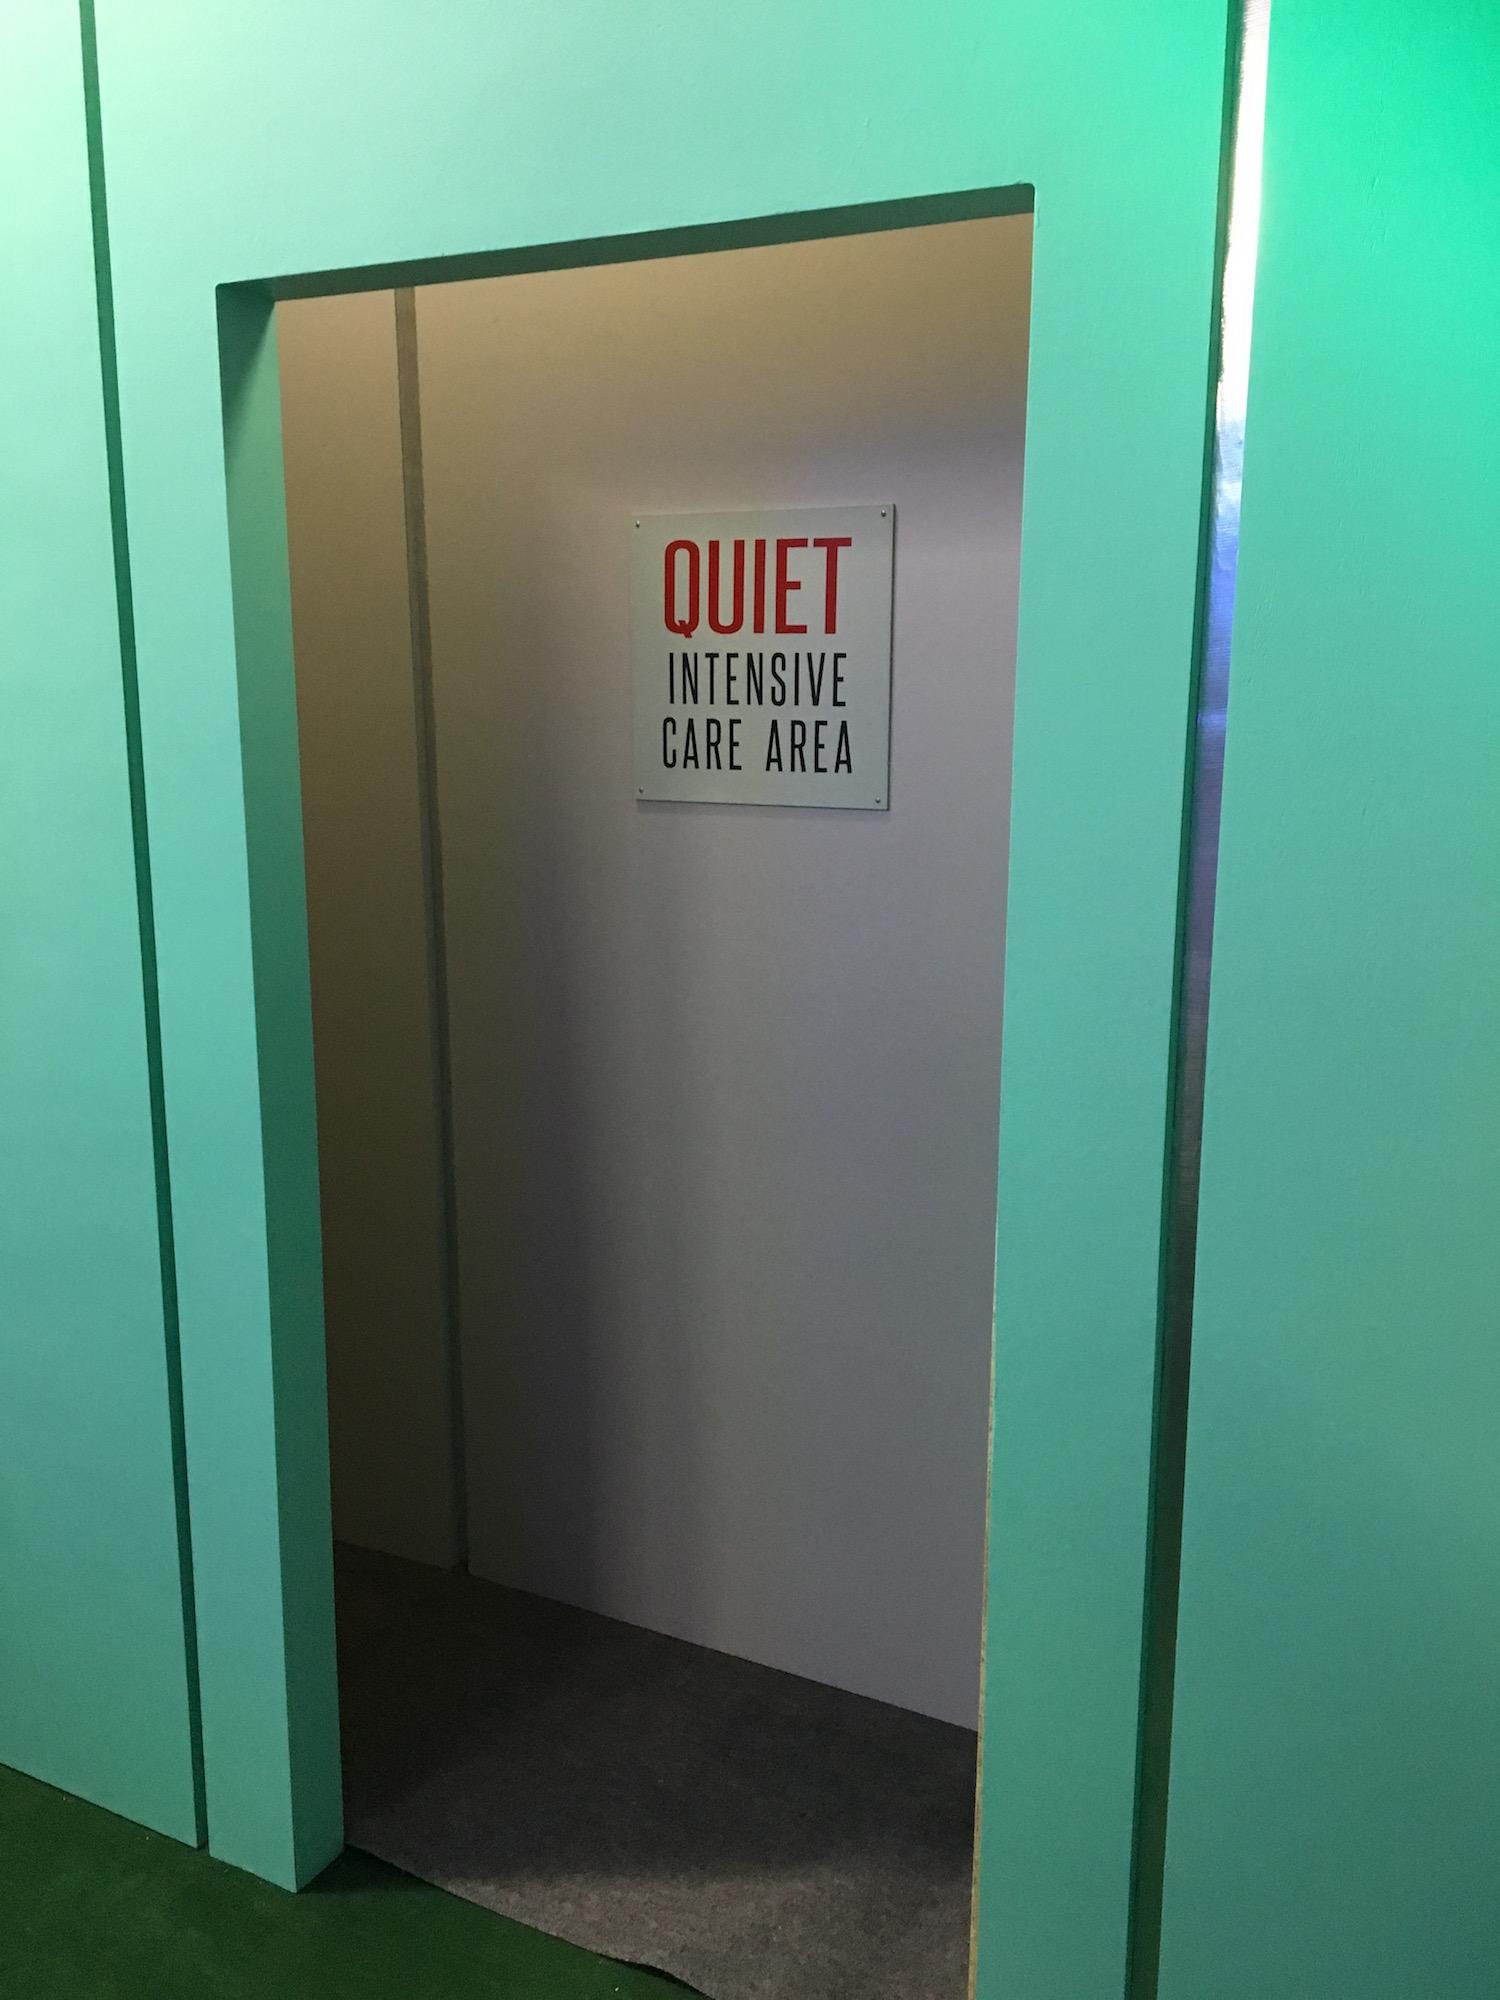 Outside Intensive Care Area ©2017 David R. George III